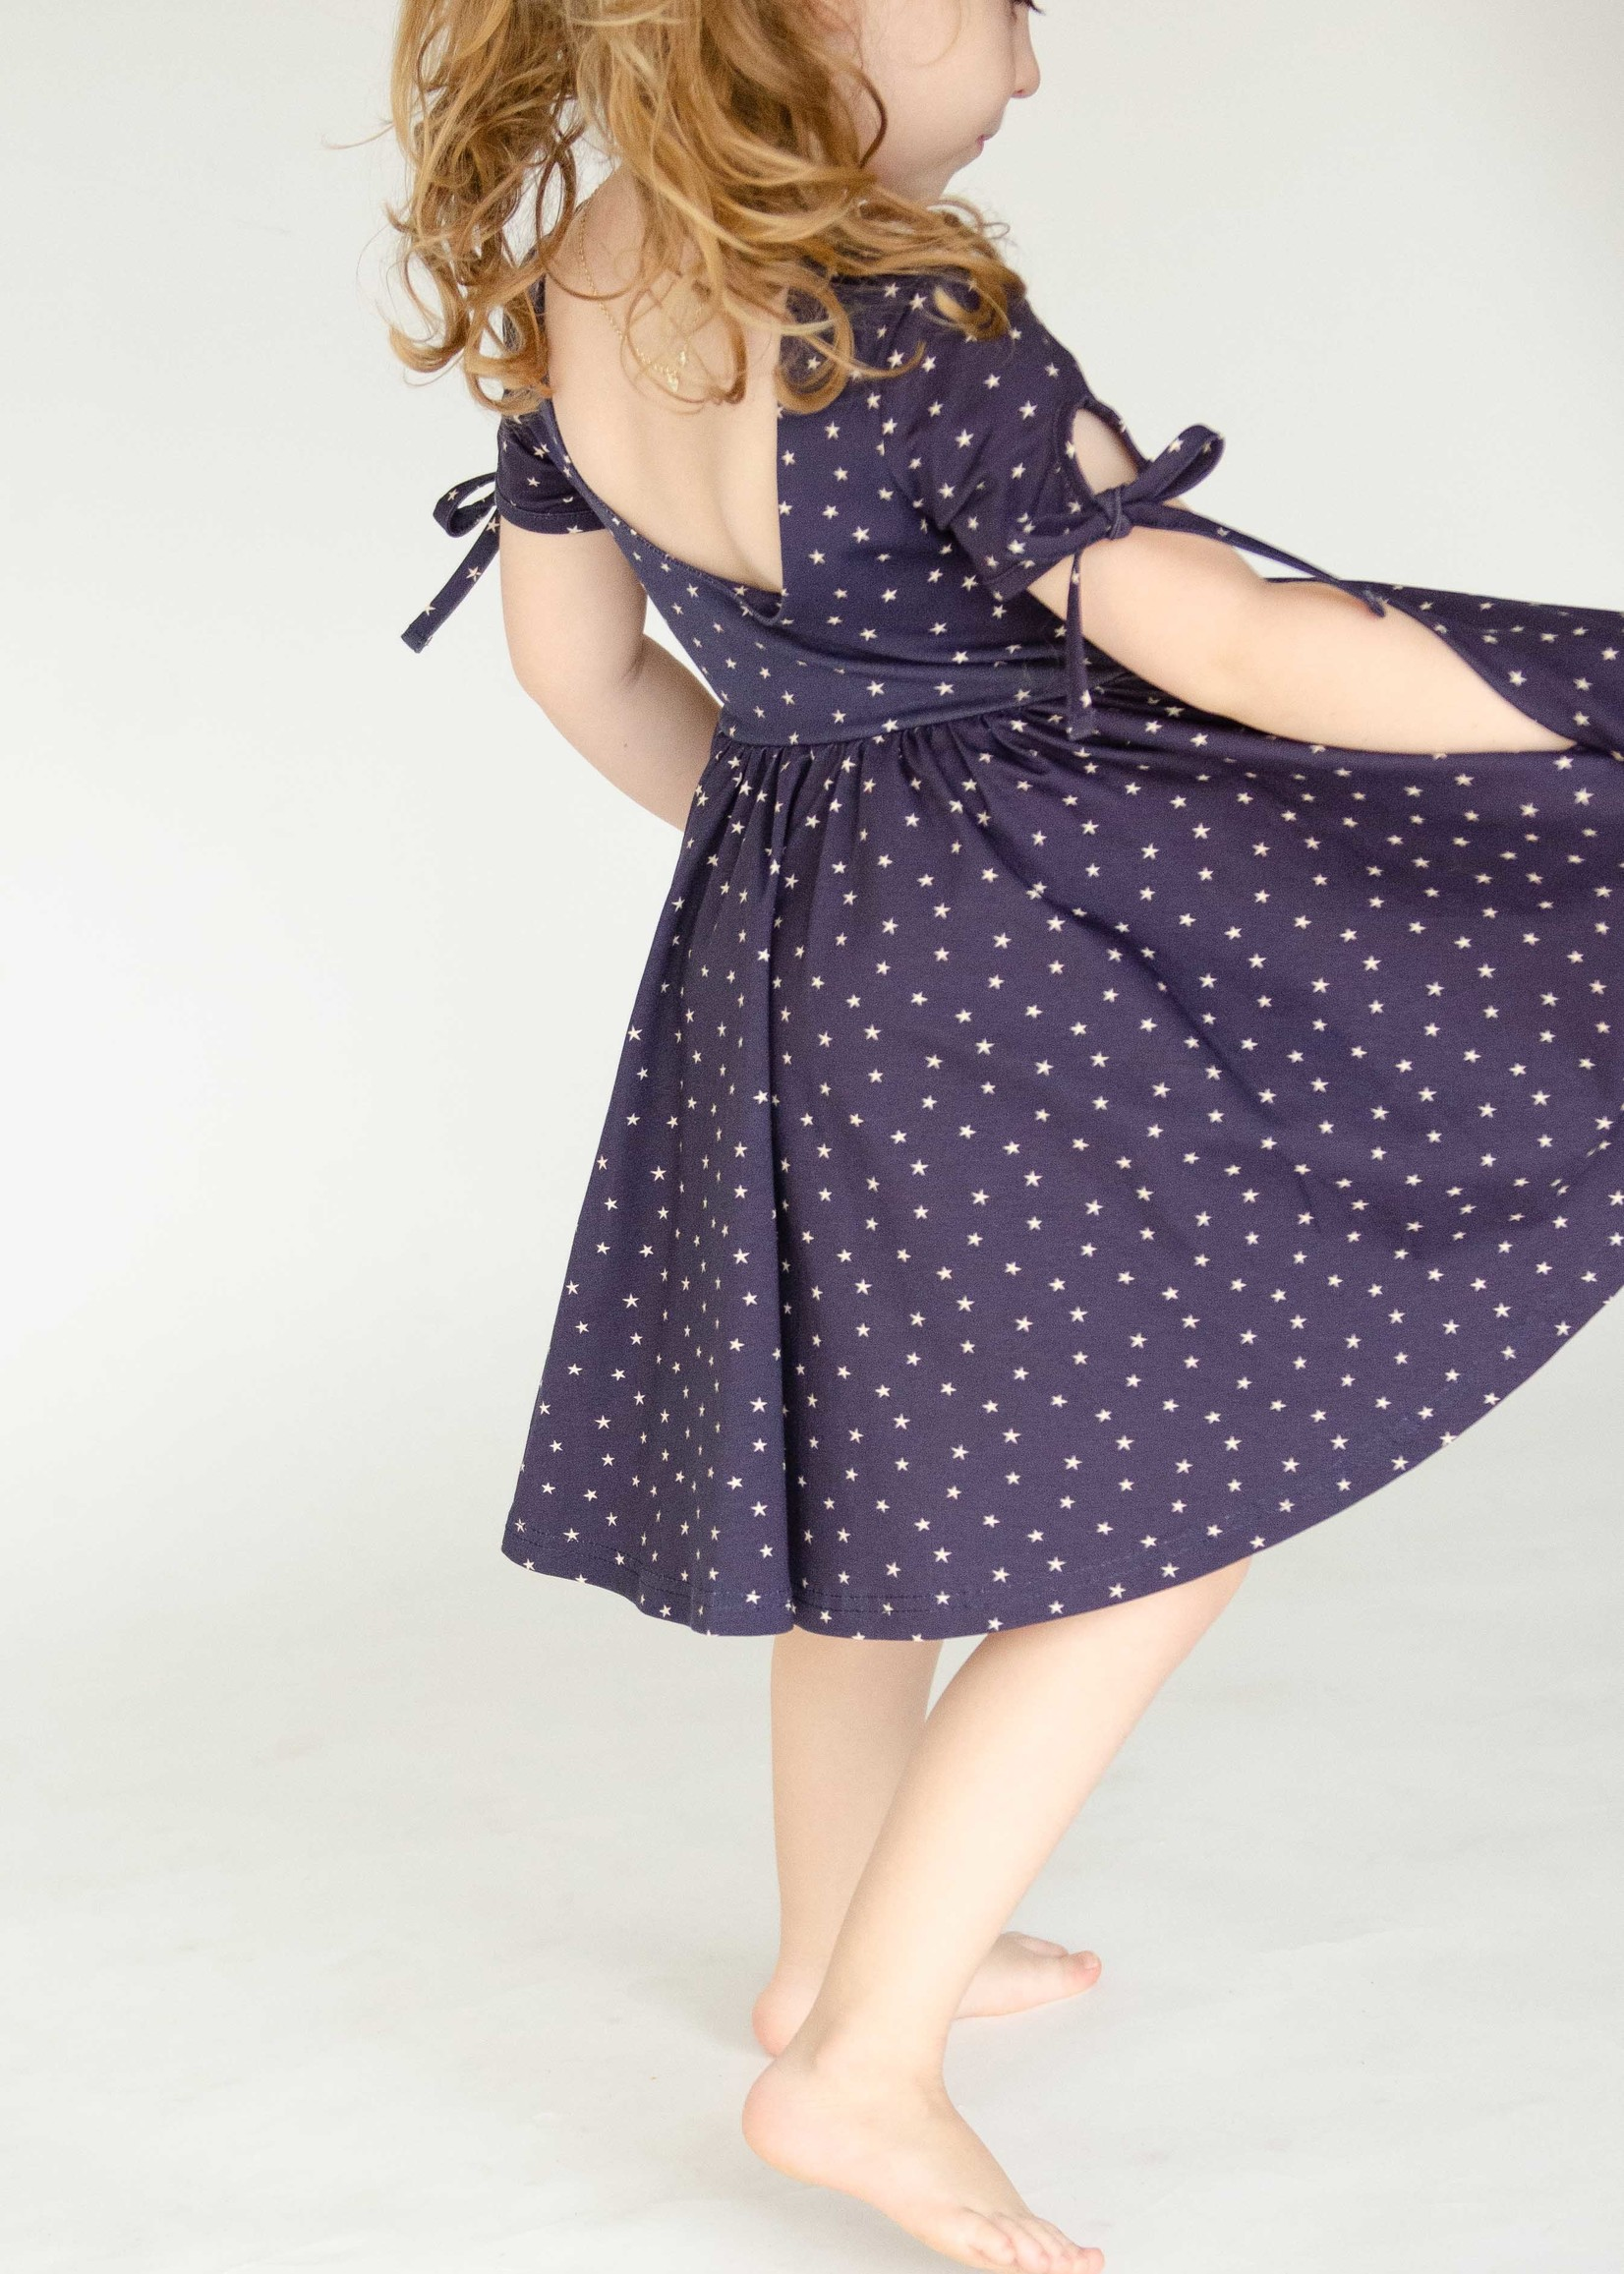 ollie jay Winnie Dress in Navy Stars